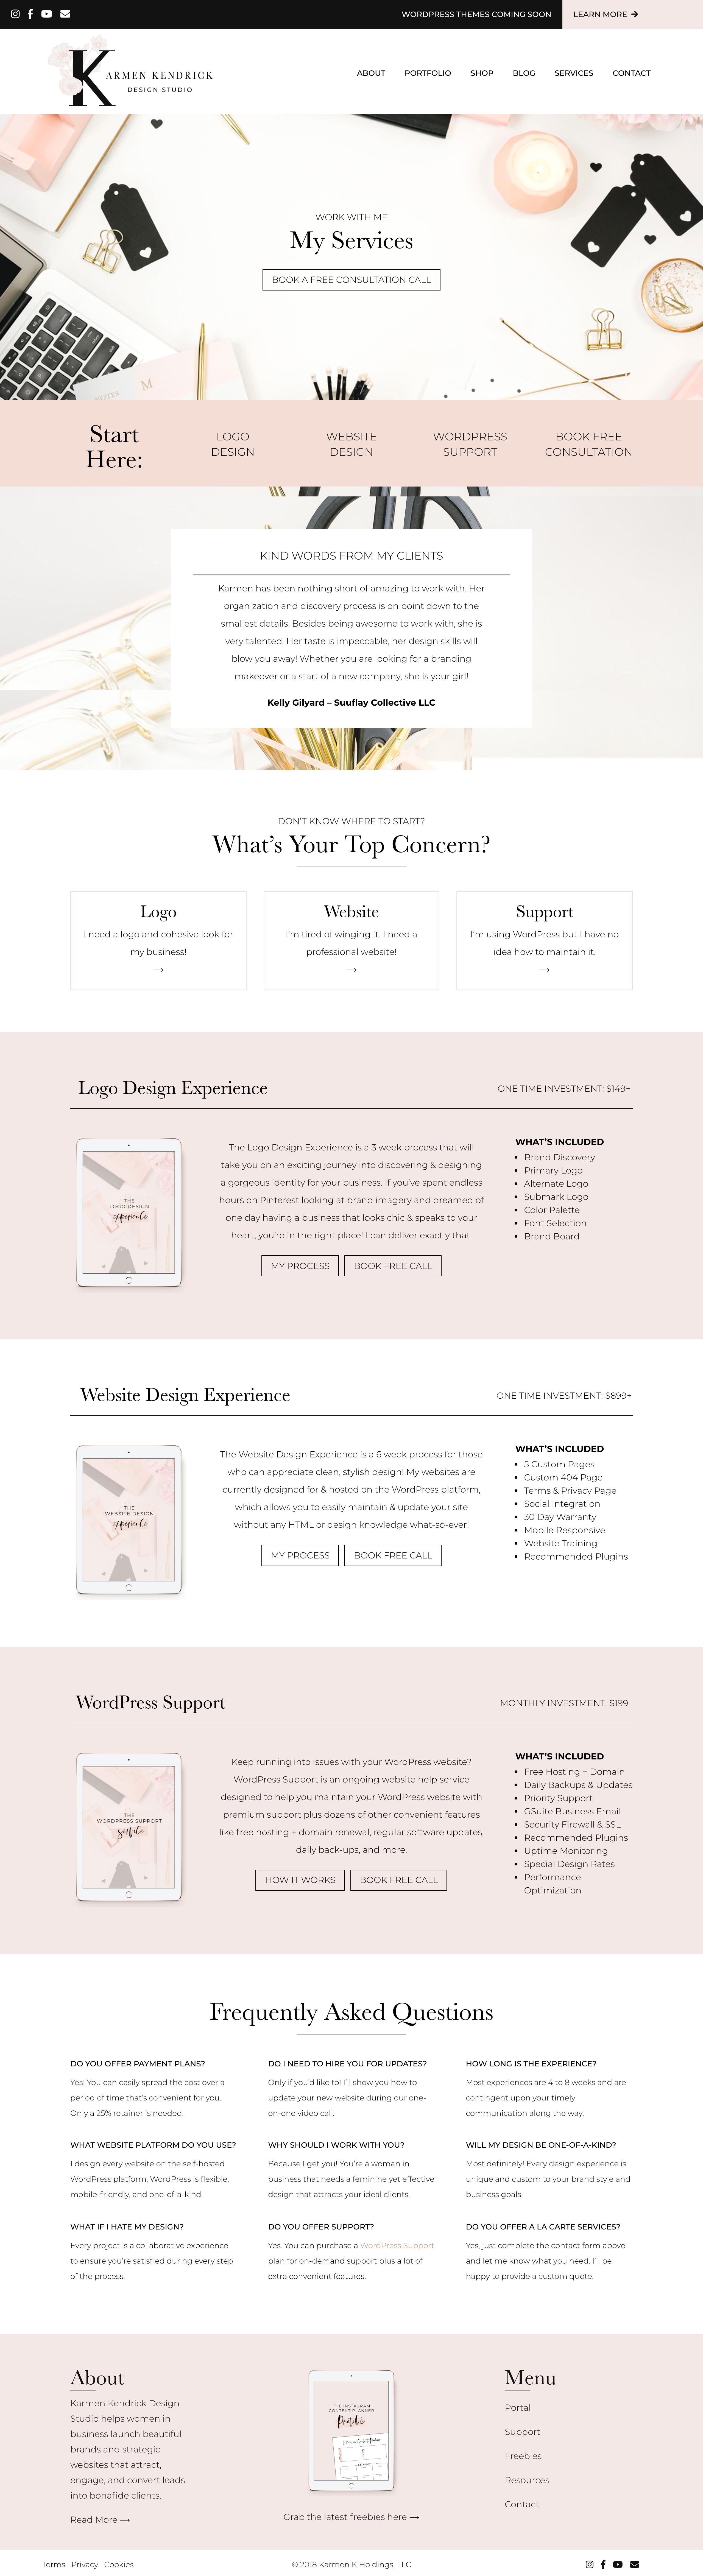 Website Design Strategy Support Web Development Design Web Design Squarespace Web Design